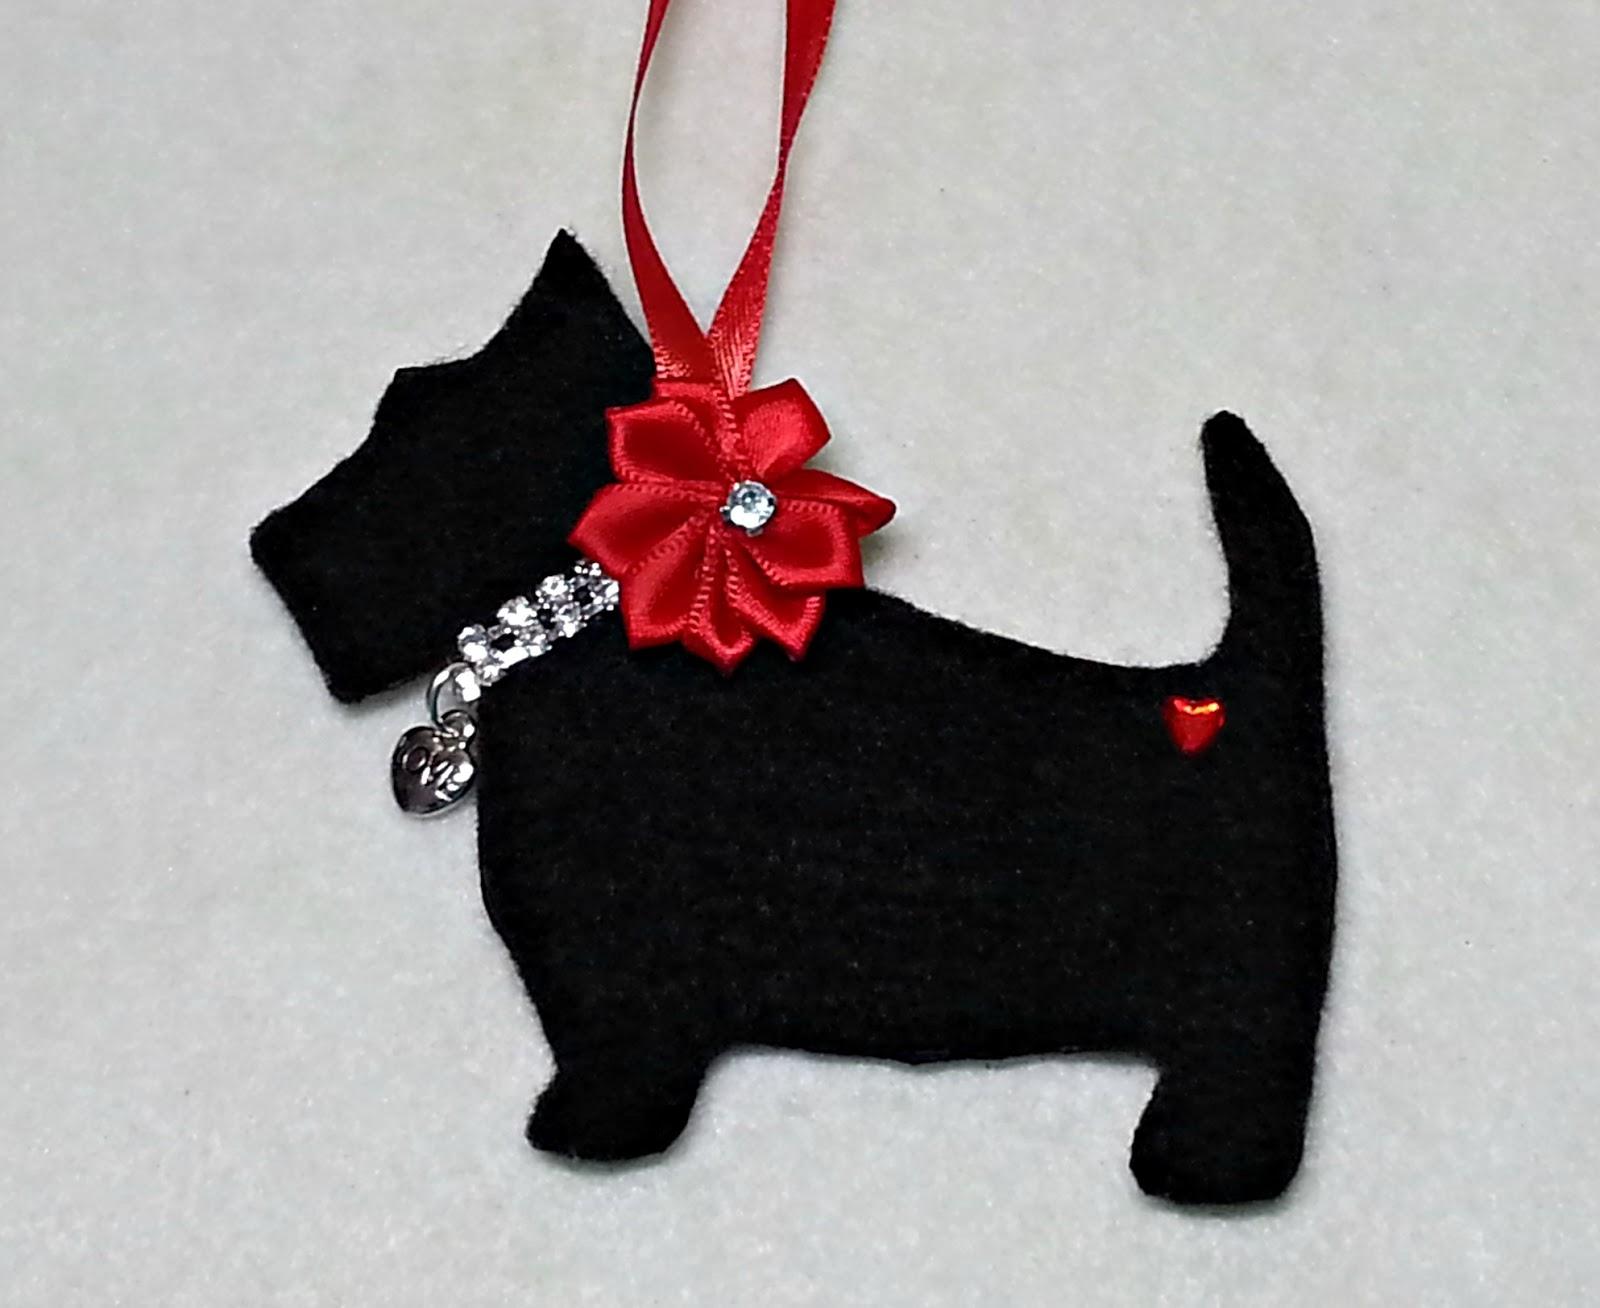 diymake an adorable scottie dog christmas ornament free pattern too - Scottie Dog Christmas Decorations